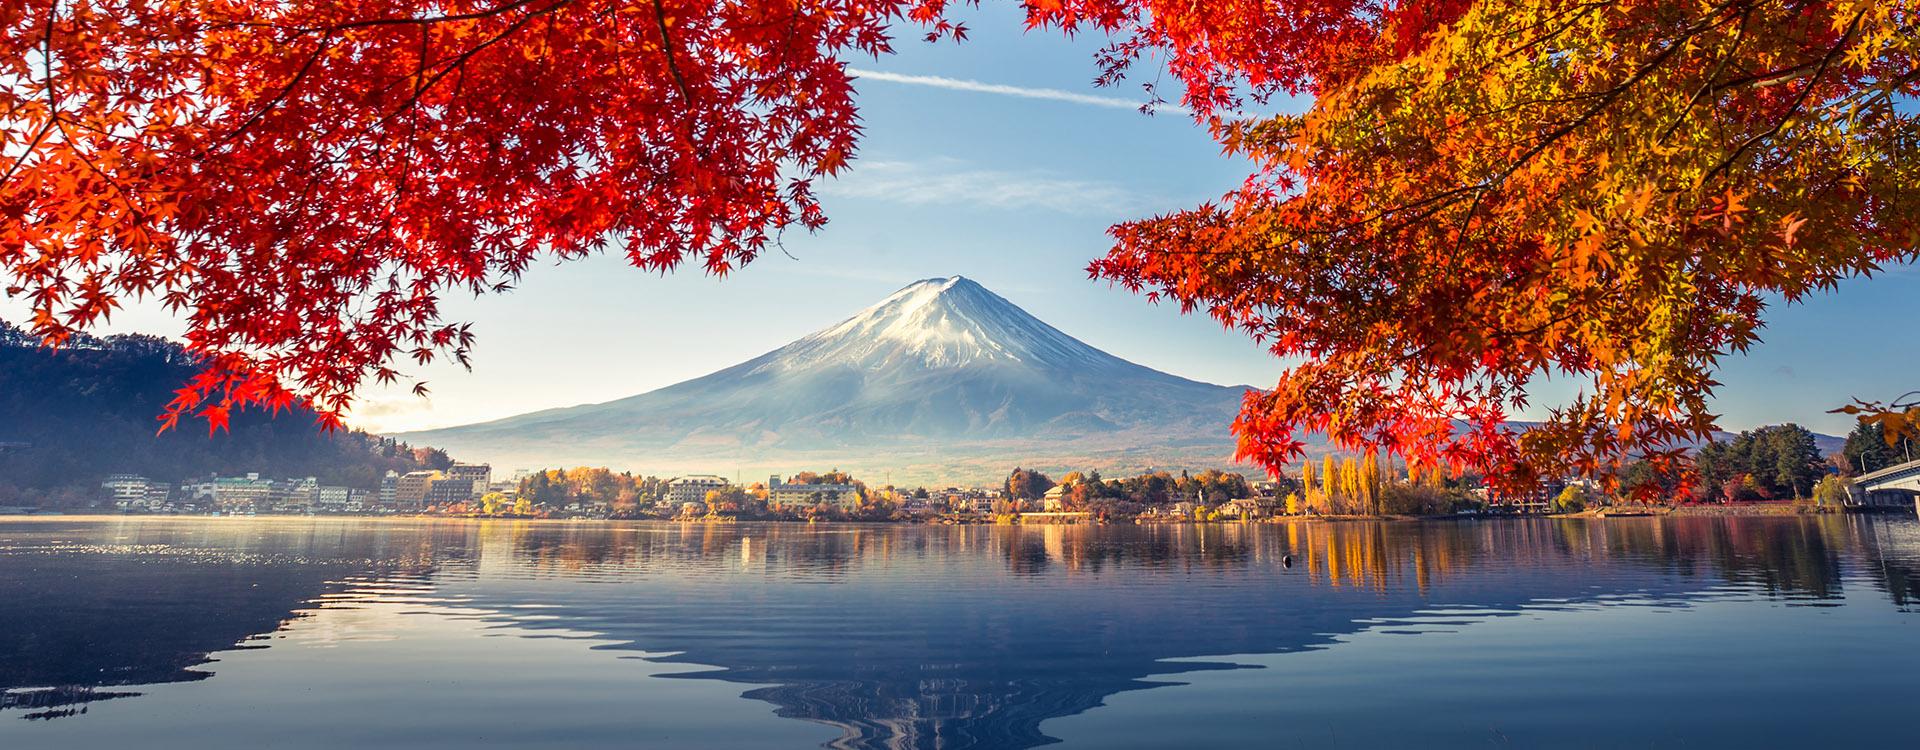 Japan, Mount Fuji, Autumn Season, Lake Kawaguchiko